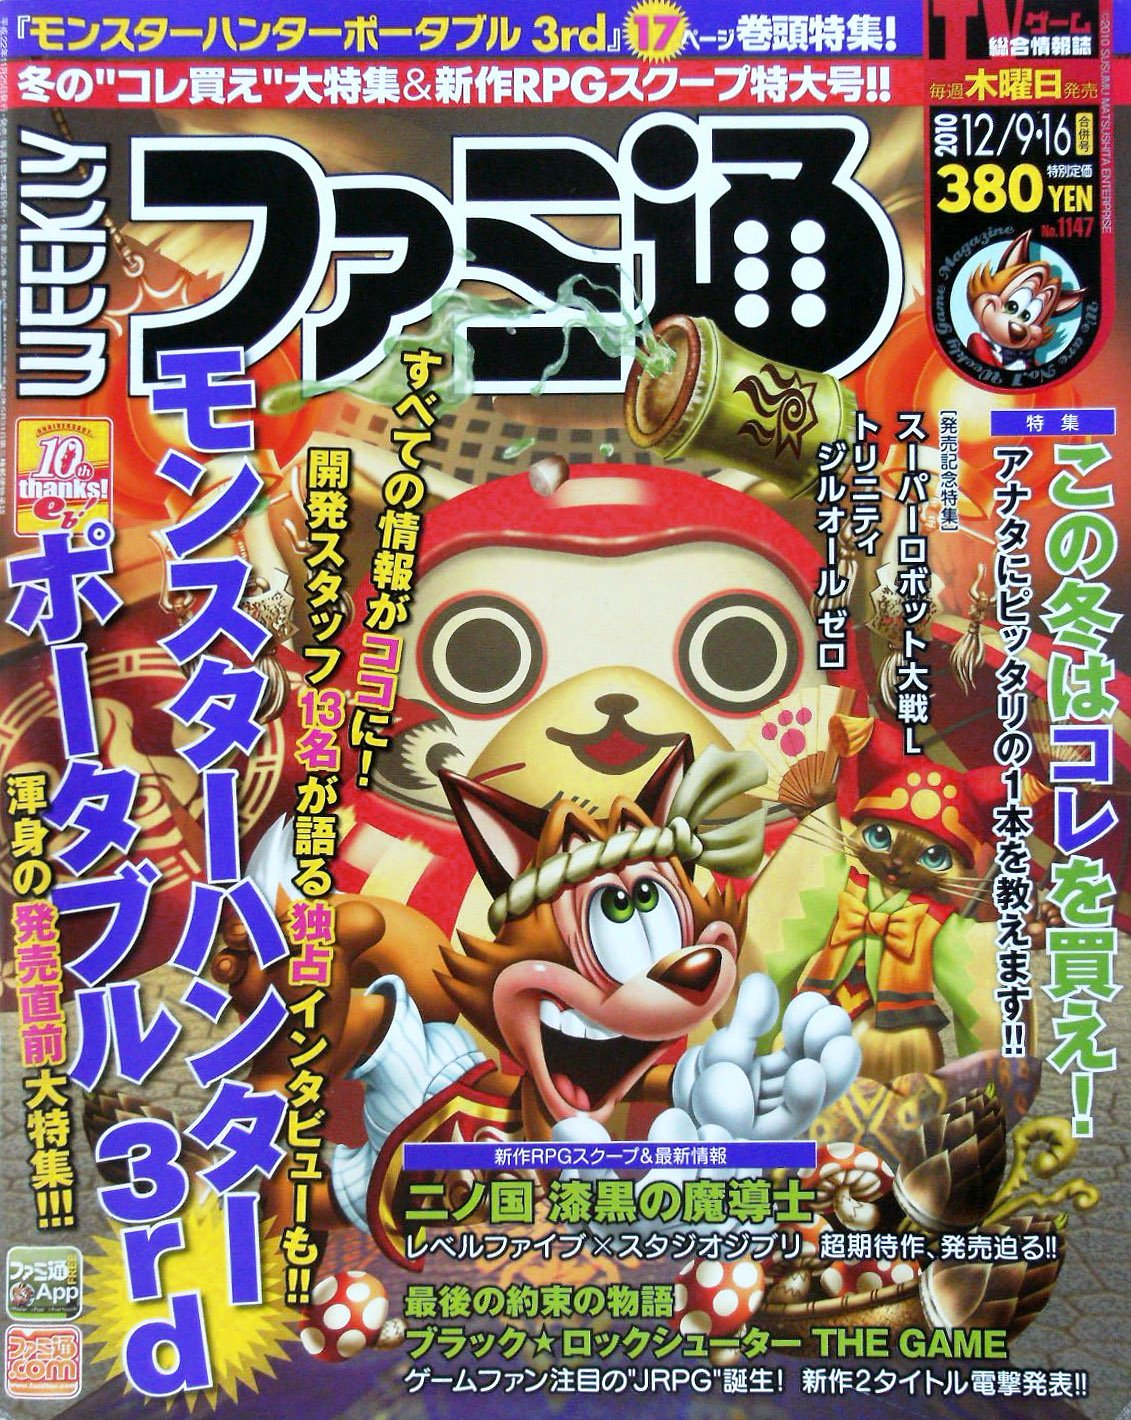 Famitsu 1147 (December 9/16, 2010)